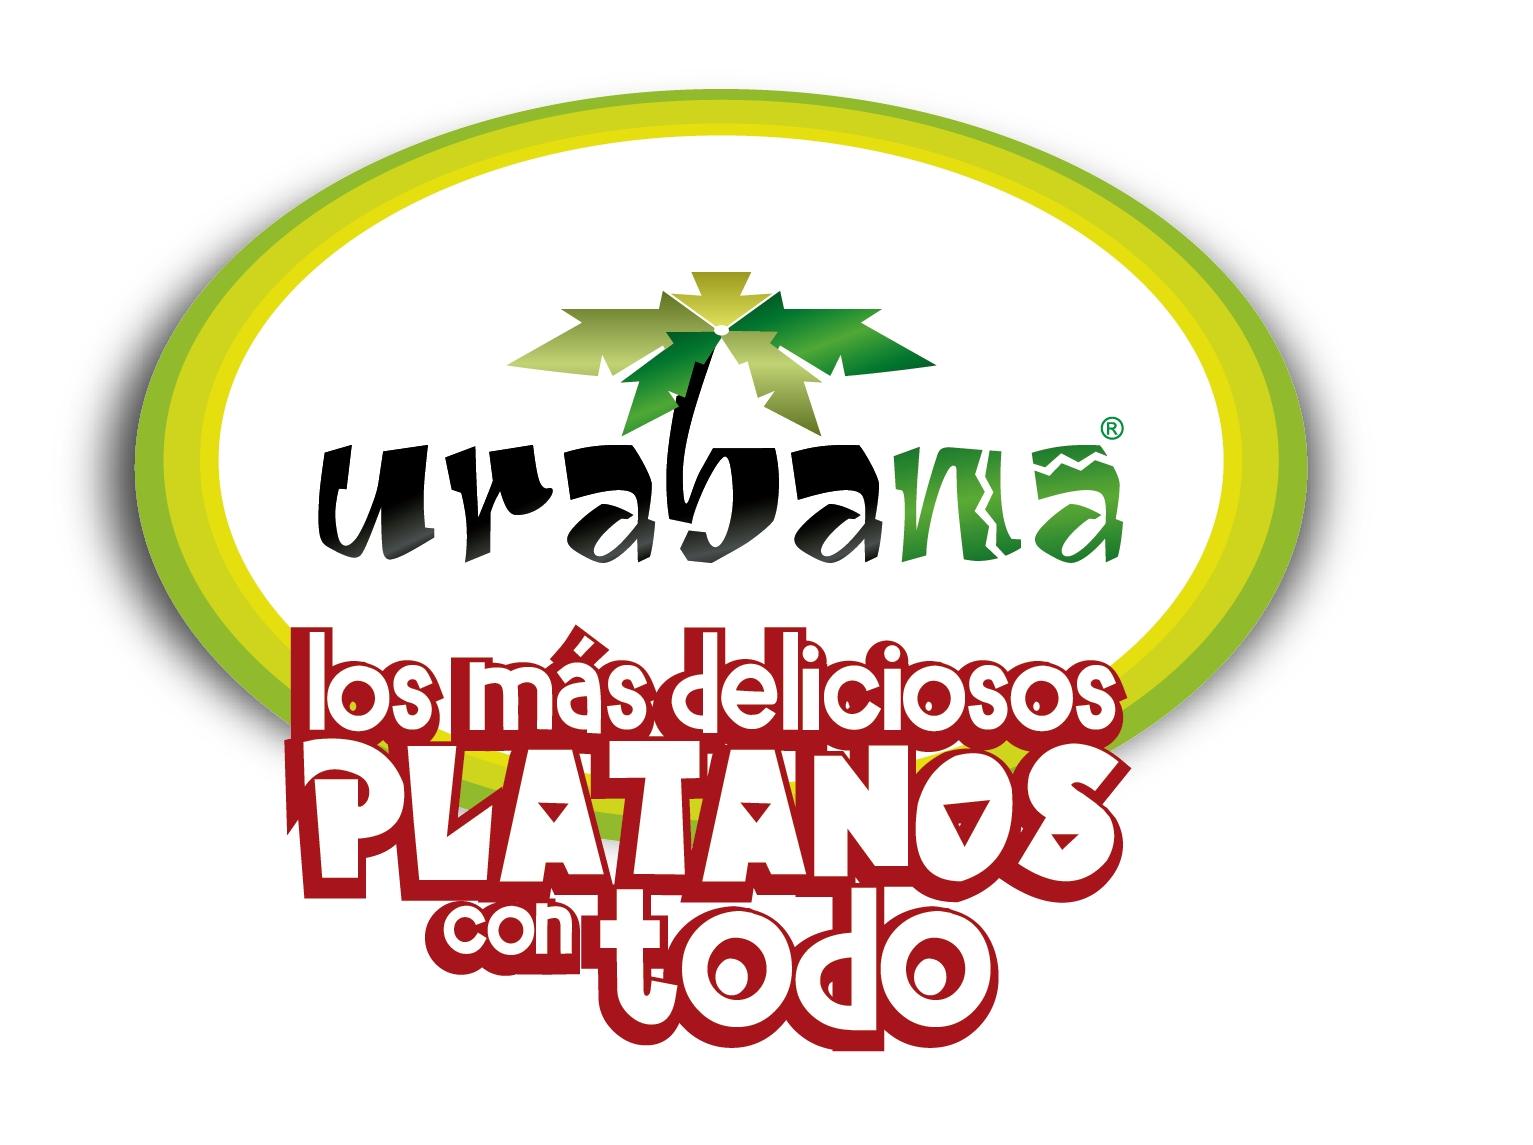 Urabana